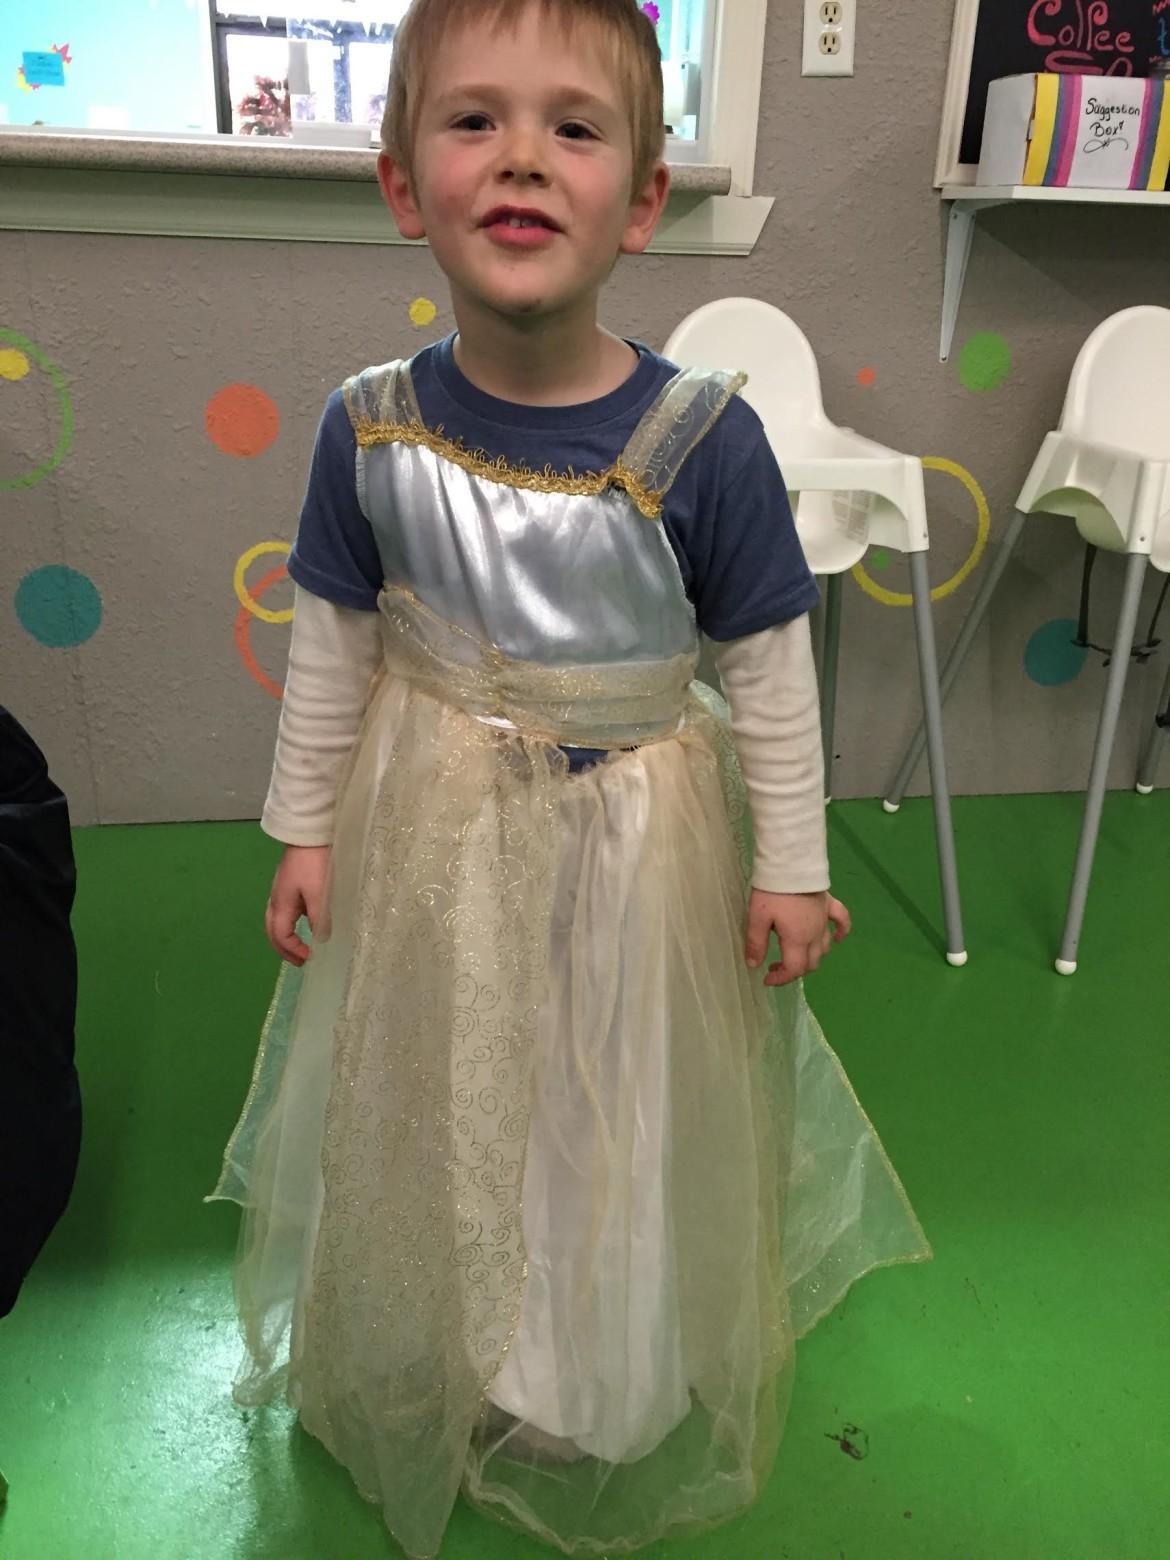 Mom Dresses Boy Like Girl - Choice 2017